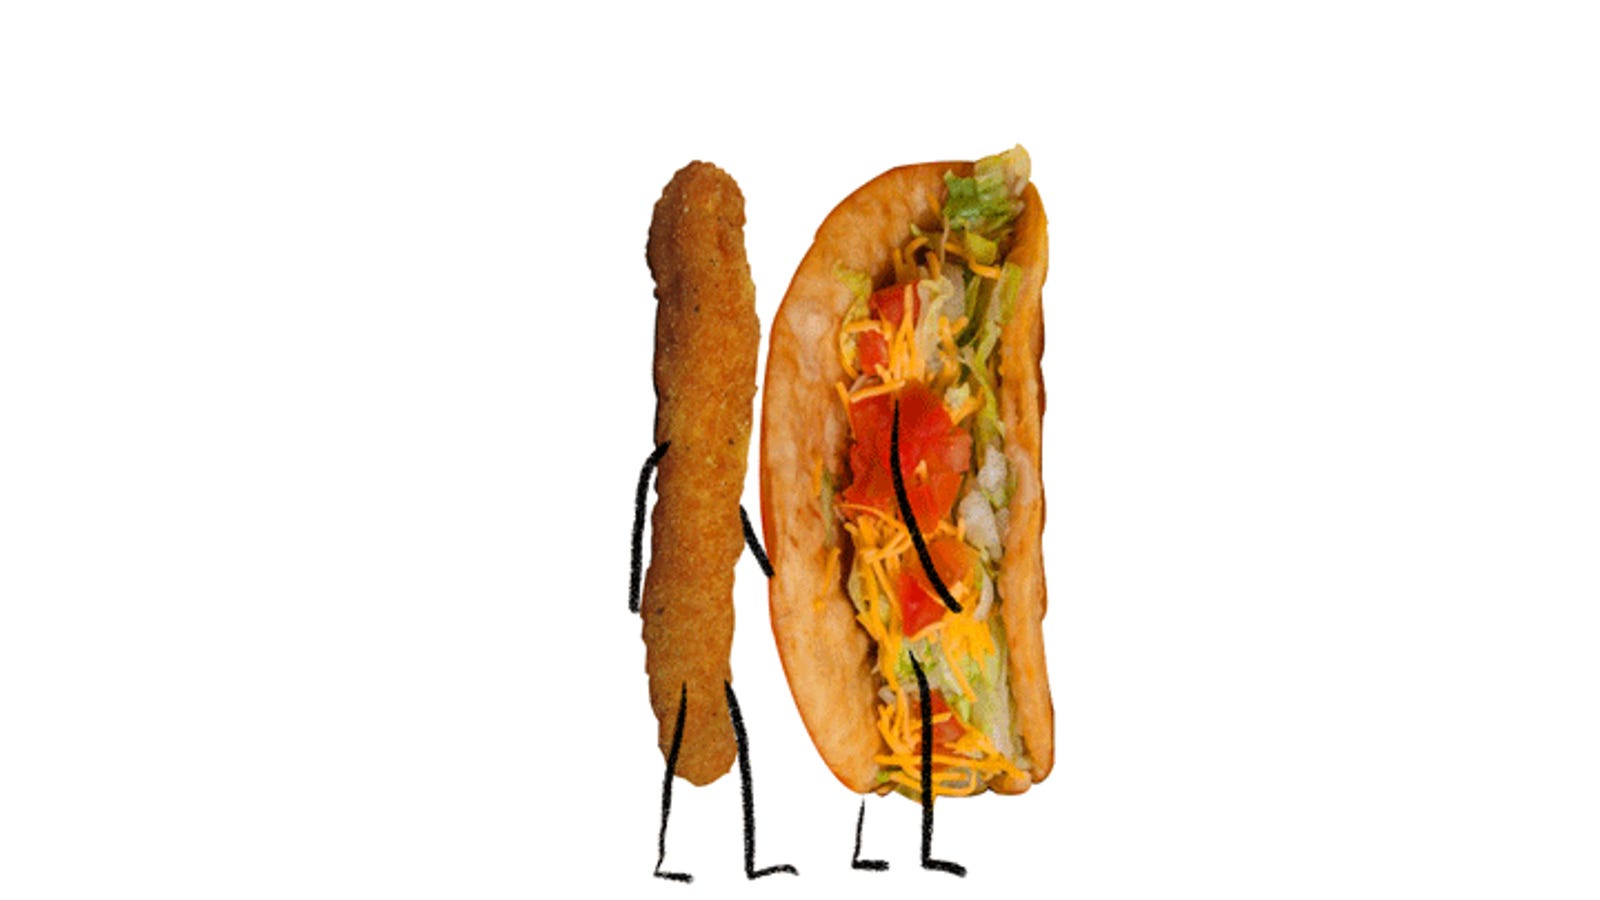 Fast Food Smackdown Burger Kings Jalapeno Chicken Fries Vs Taco Bells Quesalupa